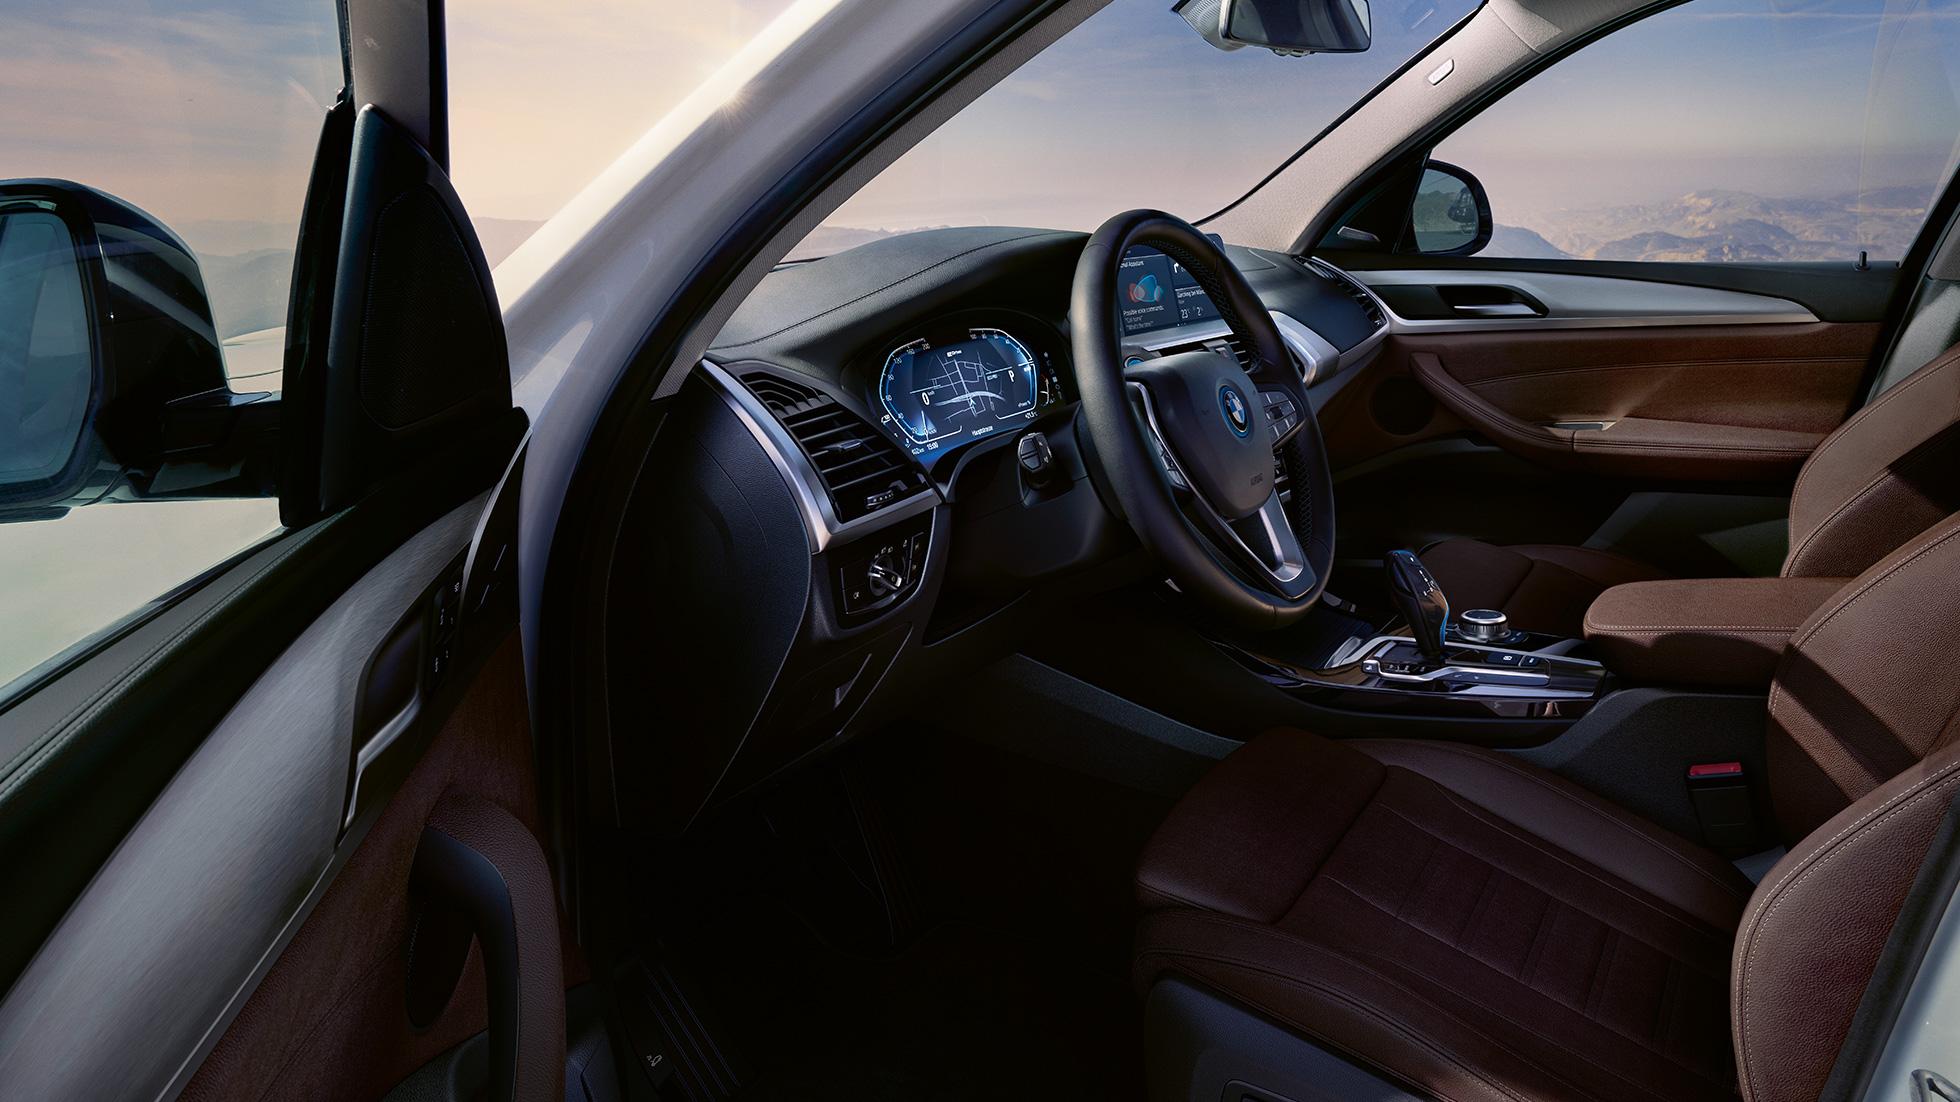 Bmw Ix3 Modelle Technische Daten Elektroauto Preise Bmw De